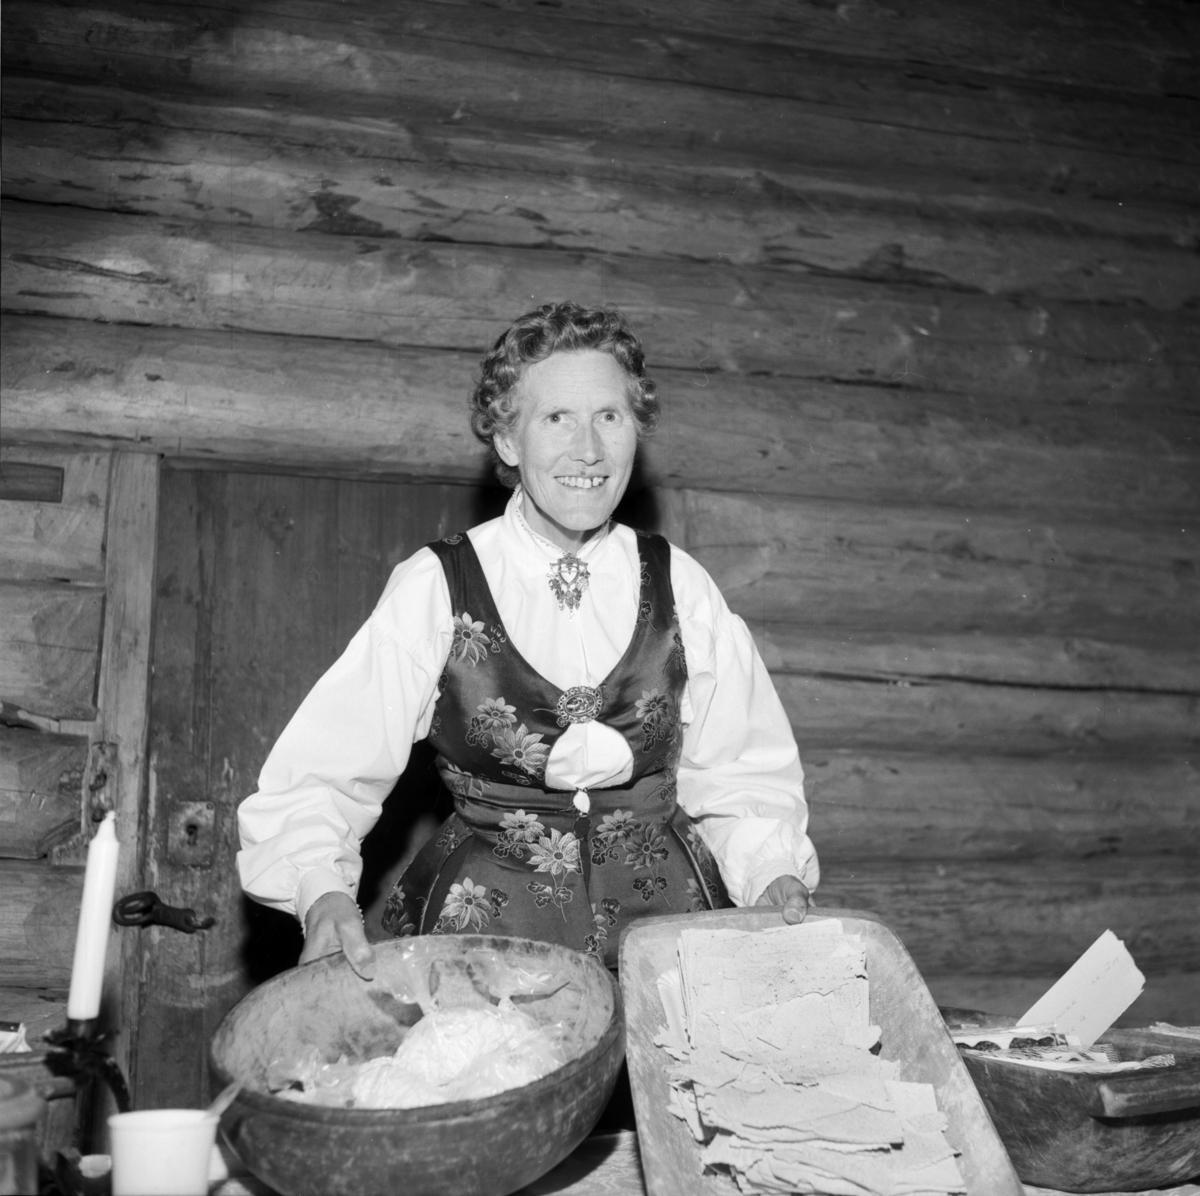 Margit Holm